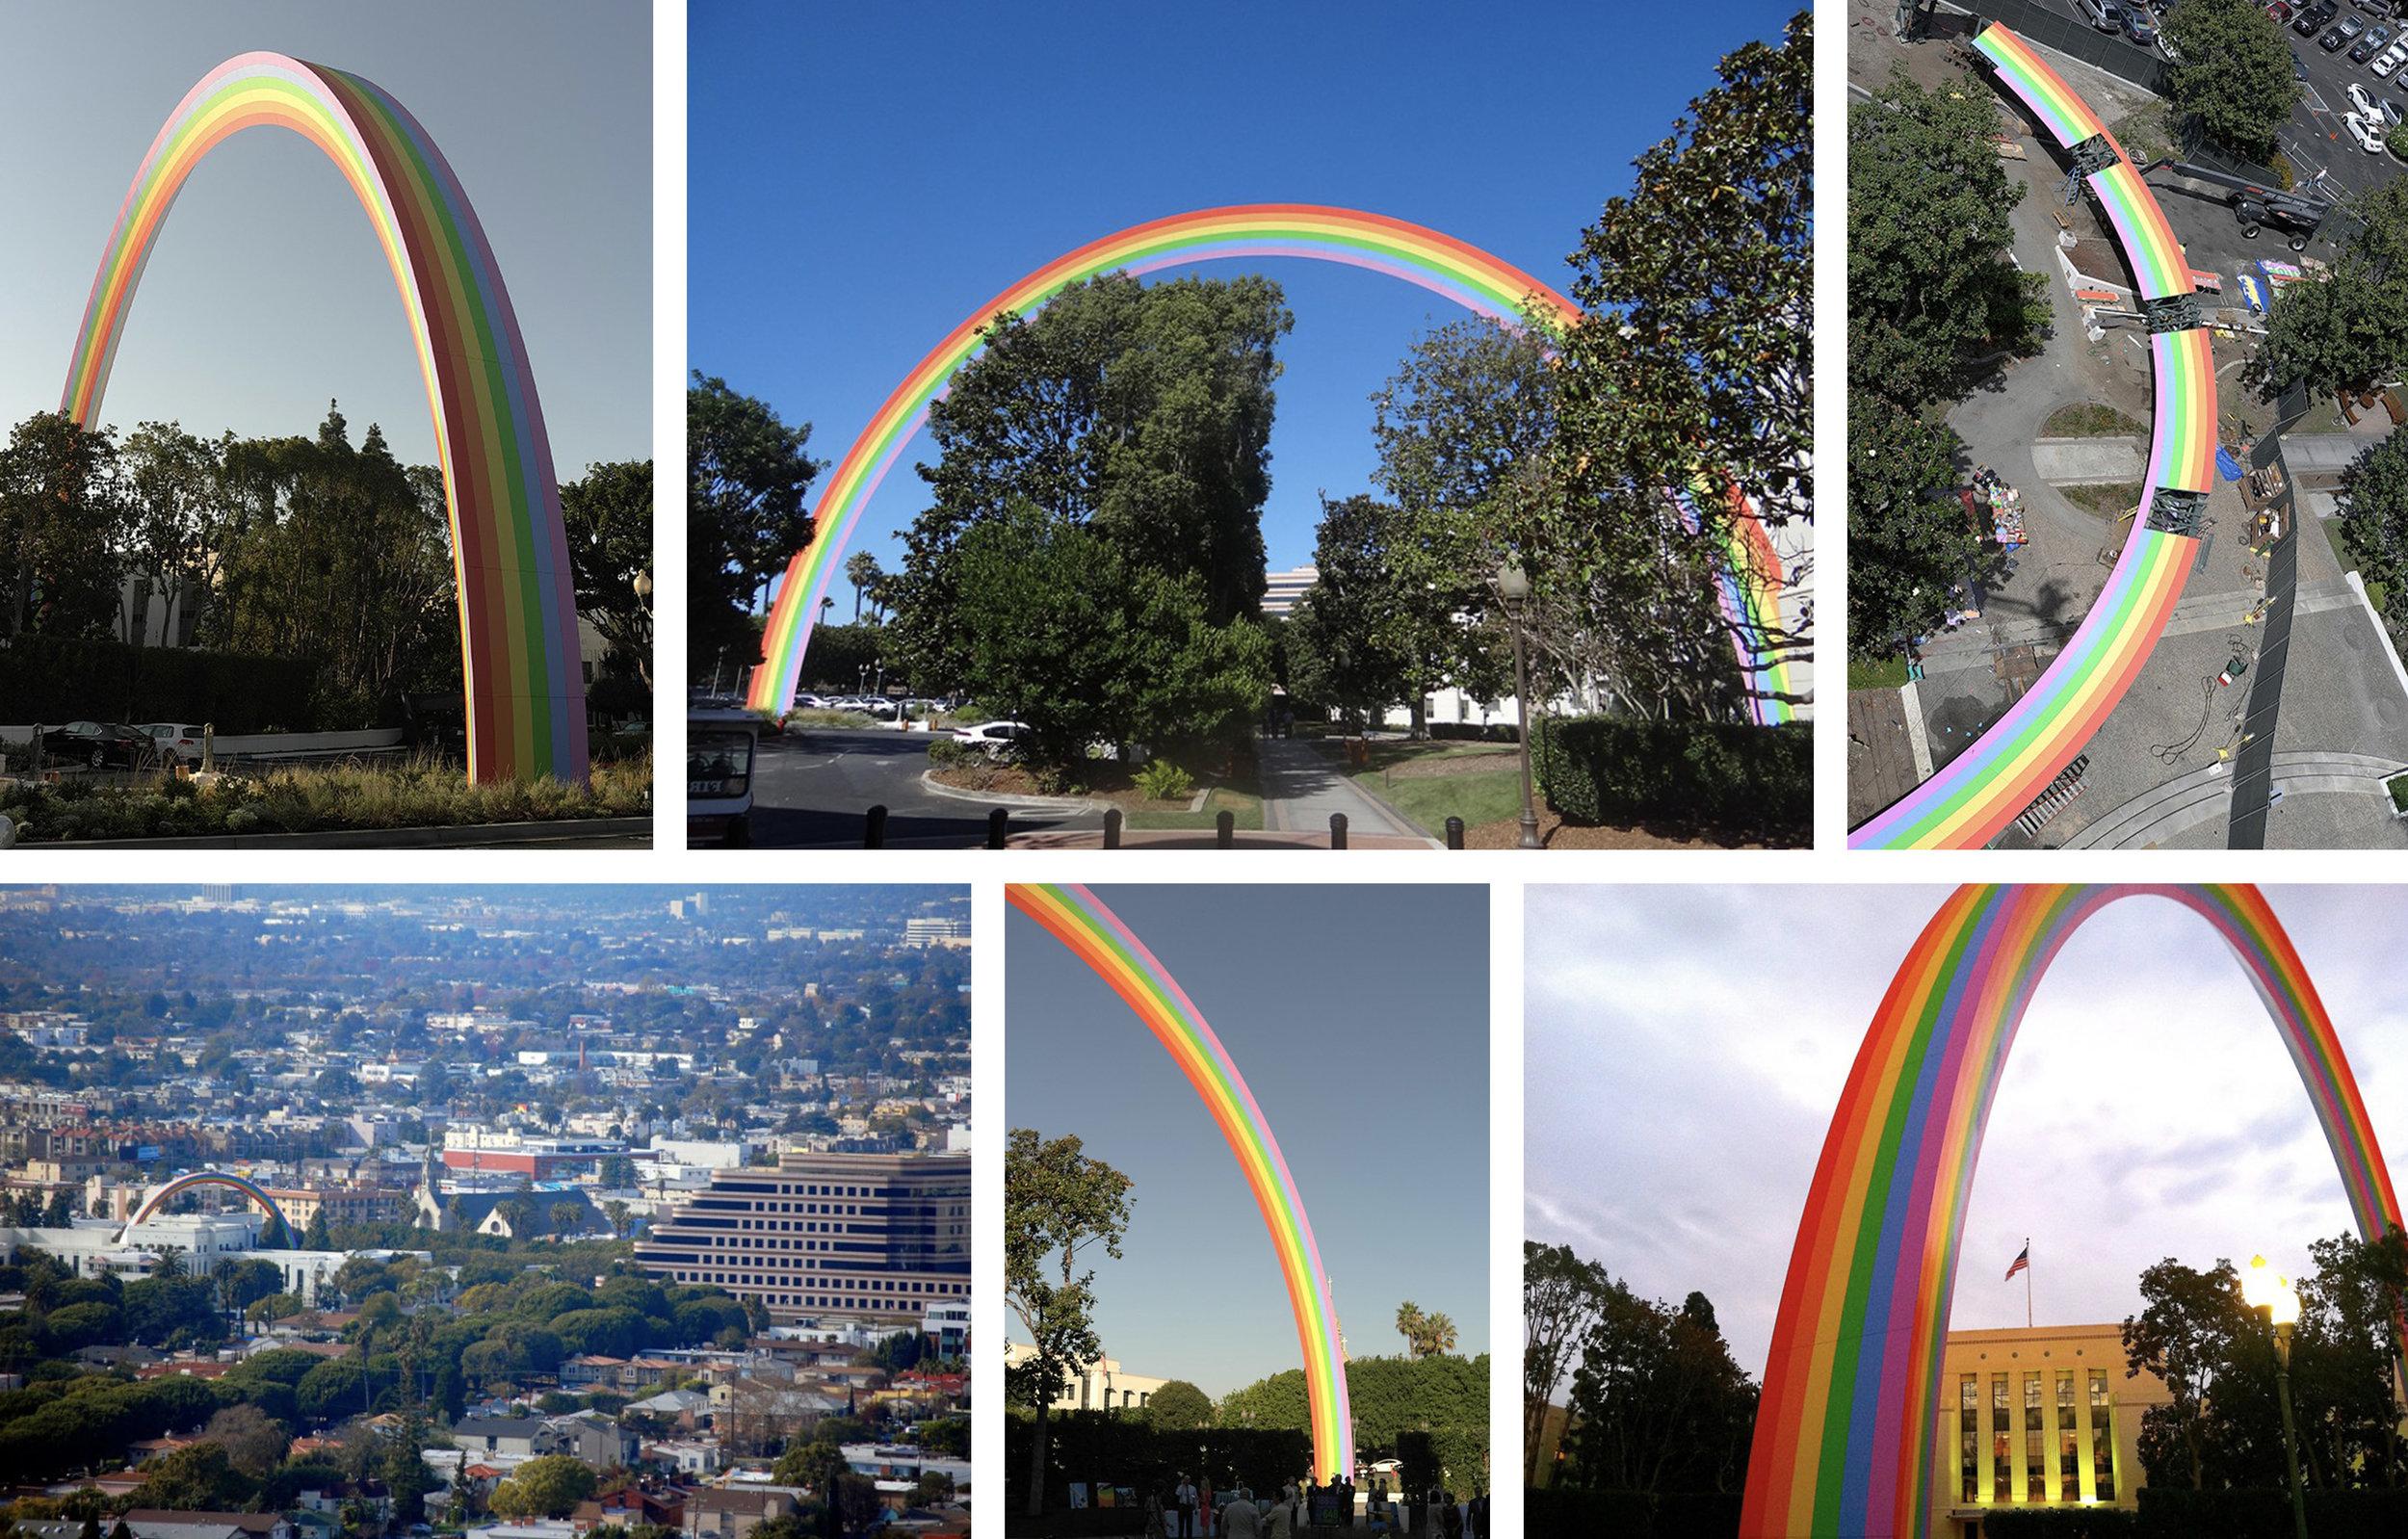 Tony Tasset Rainbow 2012 Resin based paint, steel, and aluminum 94 x 188 x 8 feet Culver City, California       View More Tony Tasset